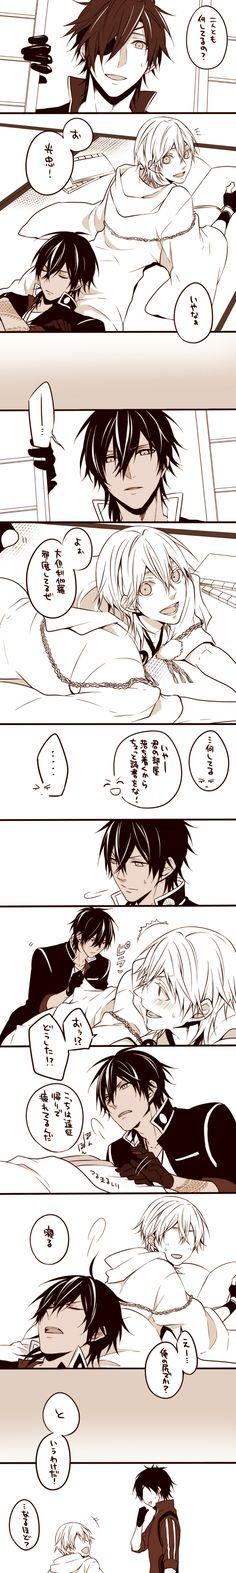 Tsurumaru, you're much too bony.